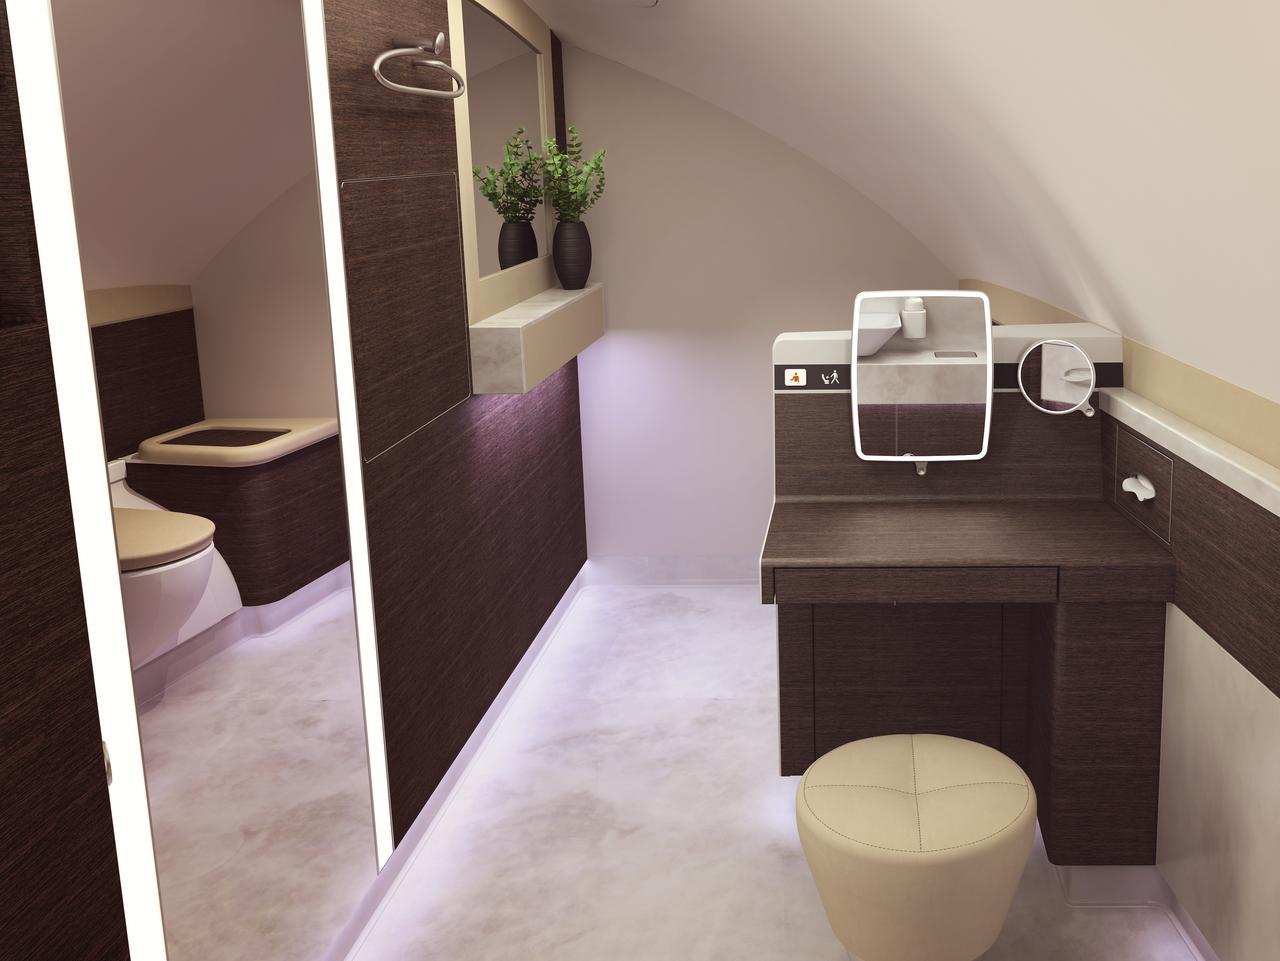 Singapore Airlines A380 Suites Amanda Woods